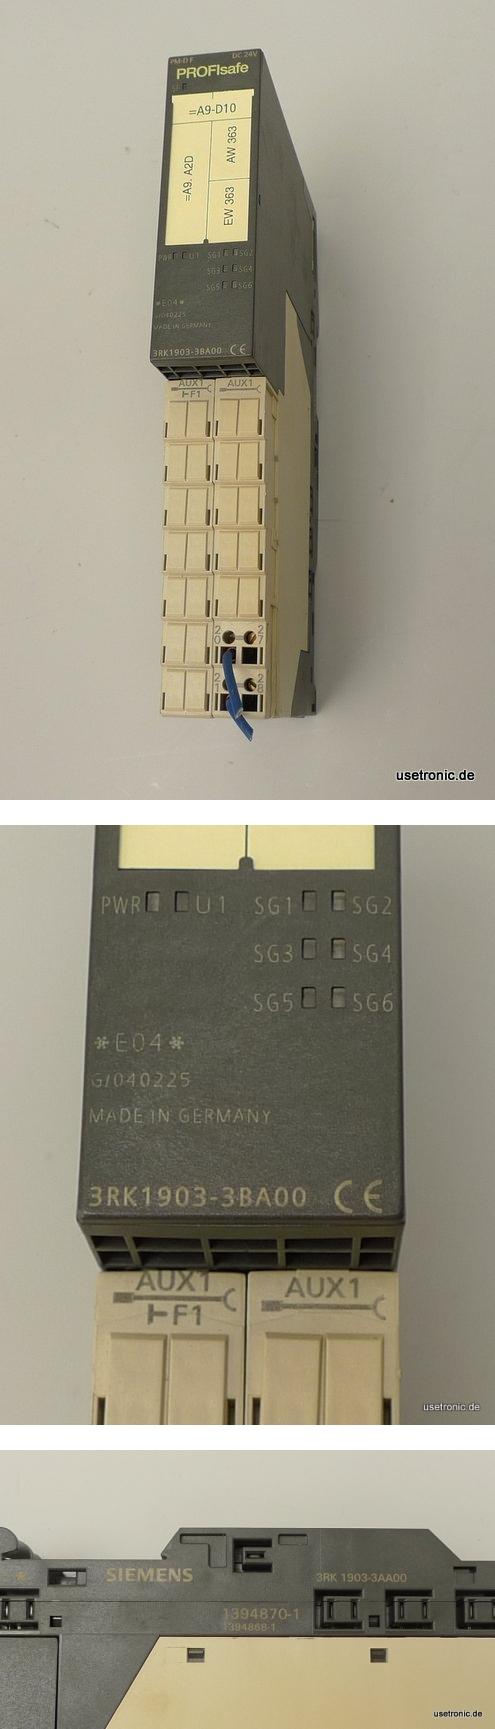 Siemens Profisafe 3RK1903-3BA00 3RK1903-3AA00 4011209547728